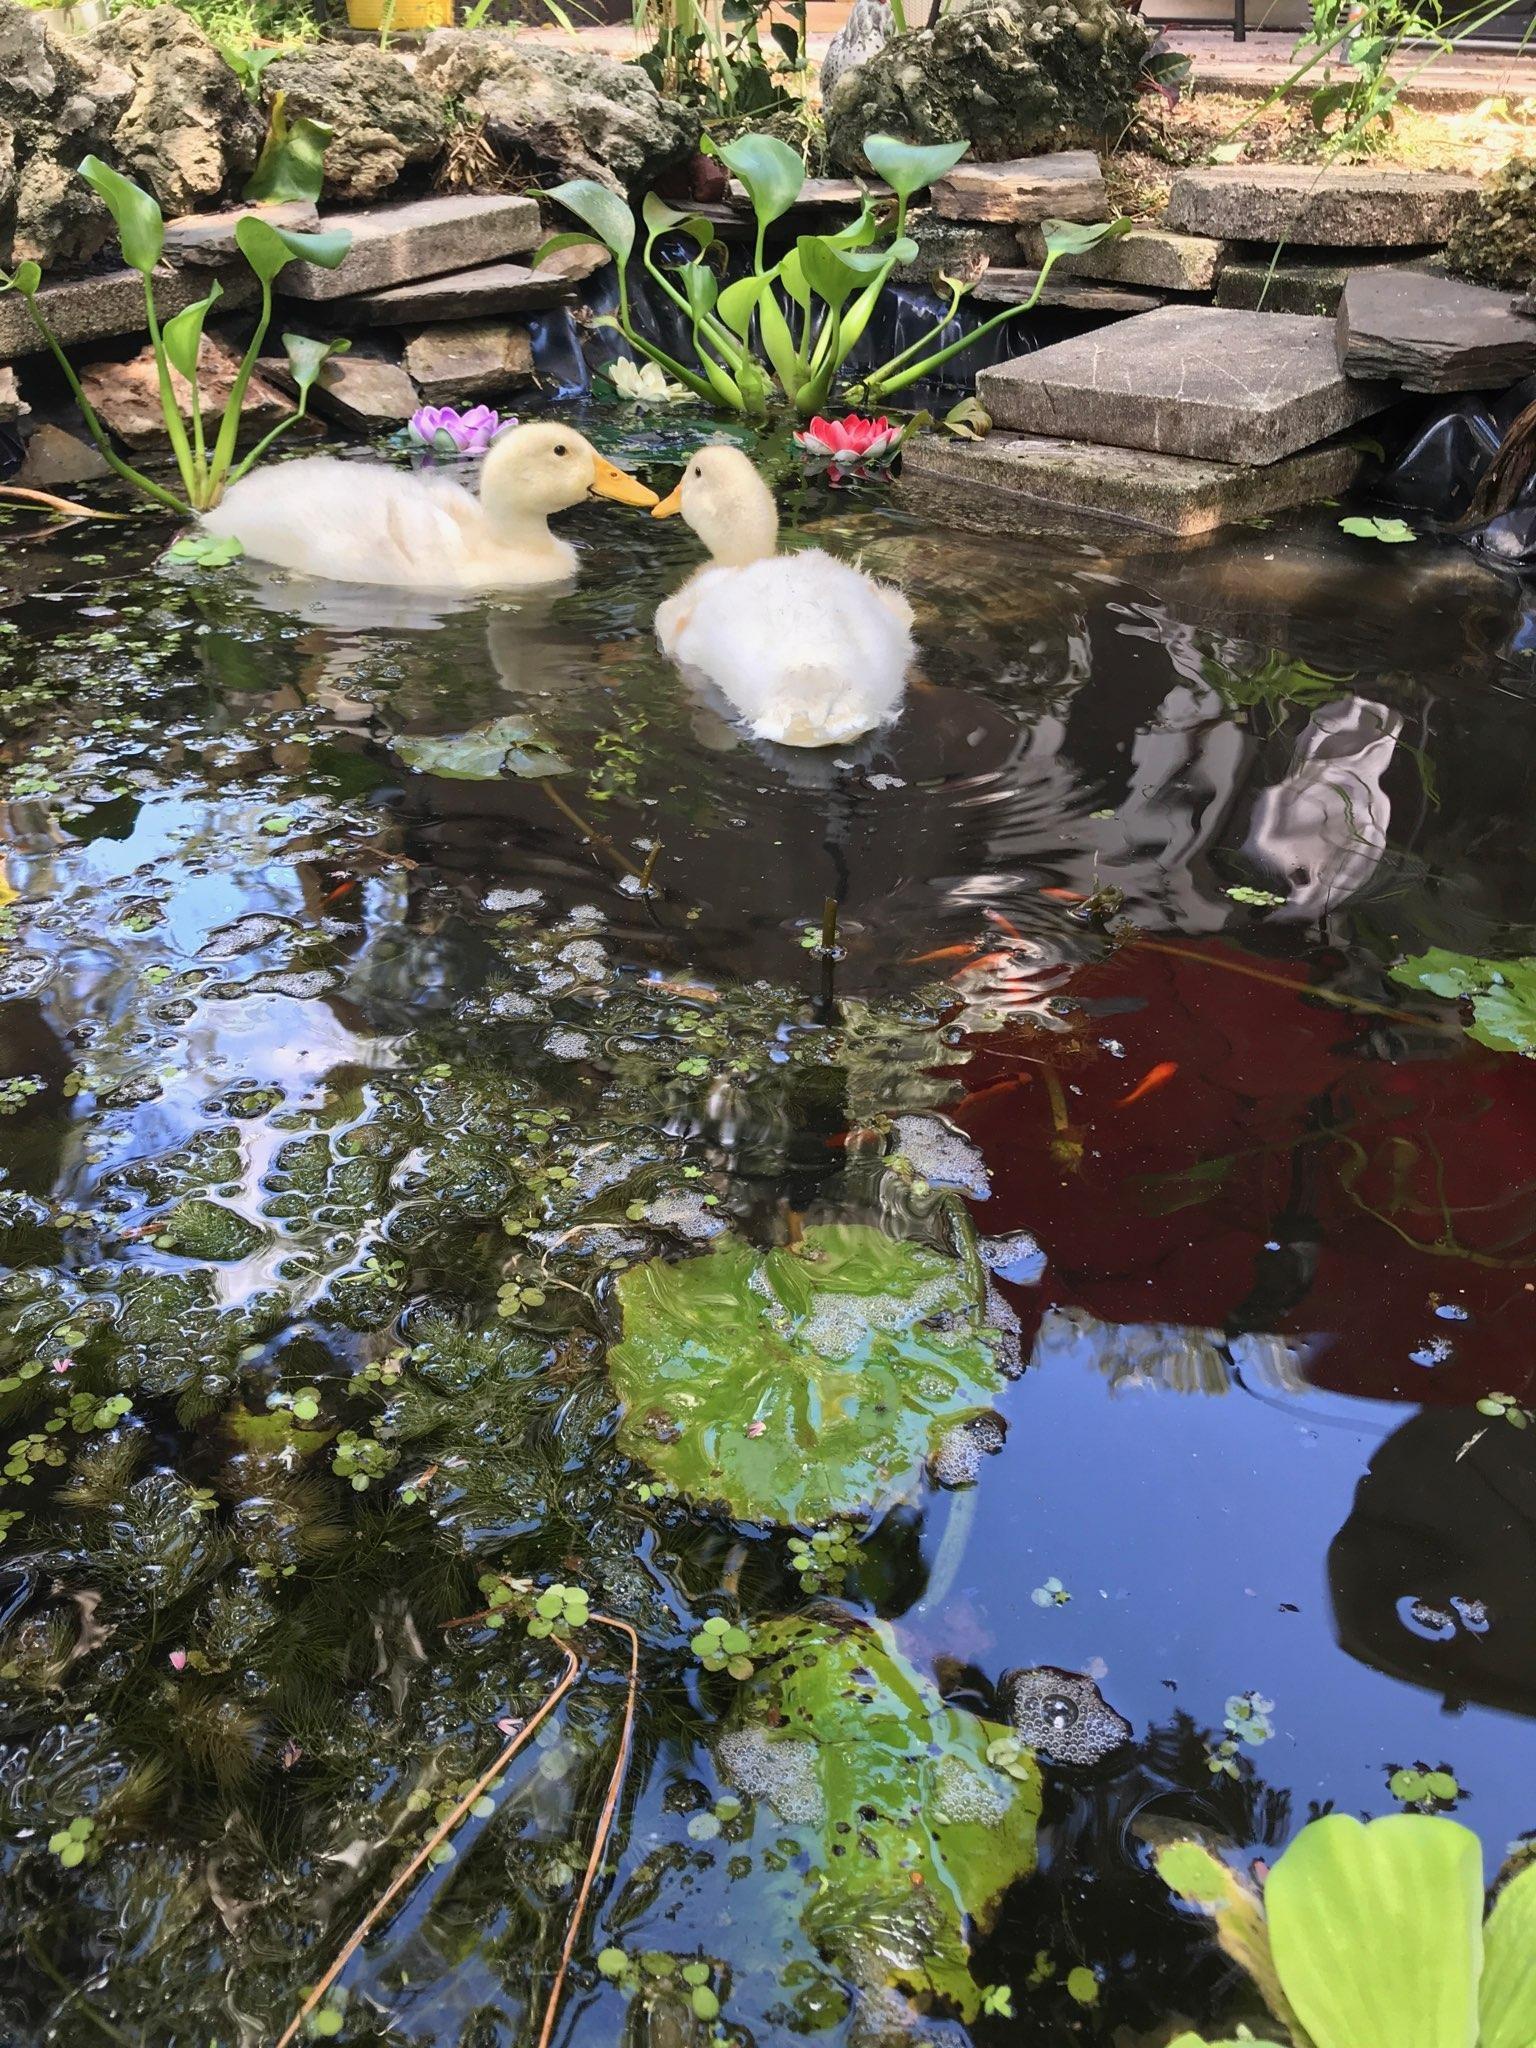 DIY Natural Duck Pond (no chemicals, pumps) with progress photos